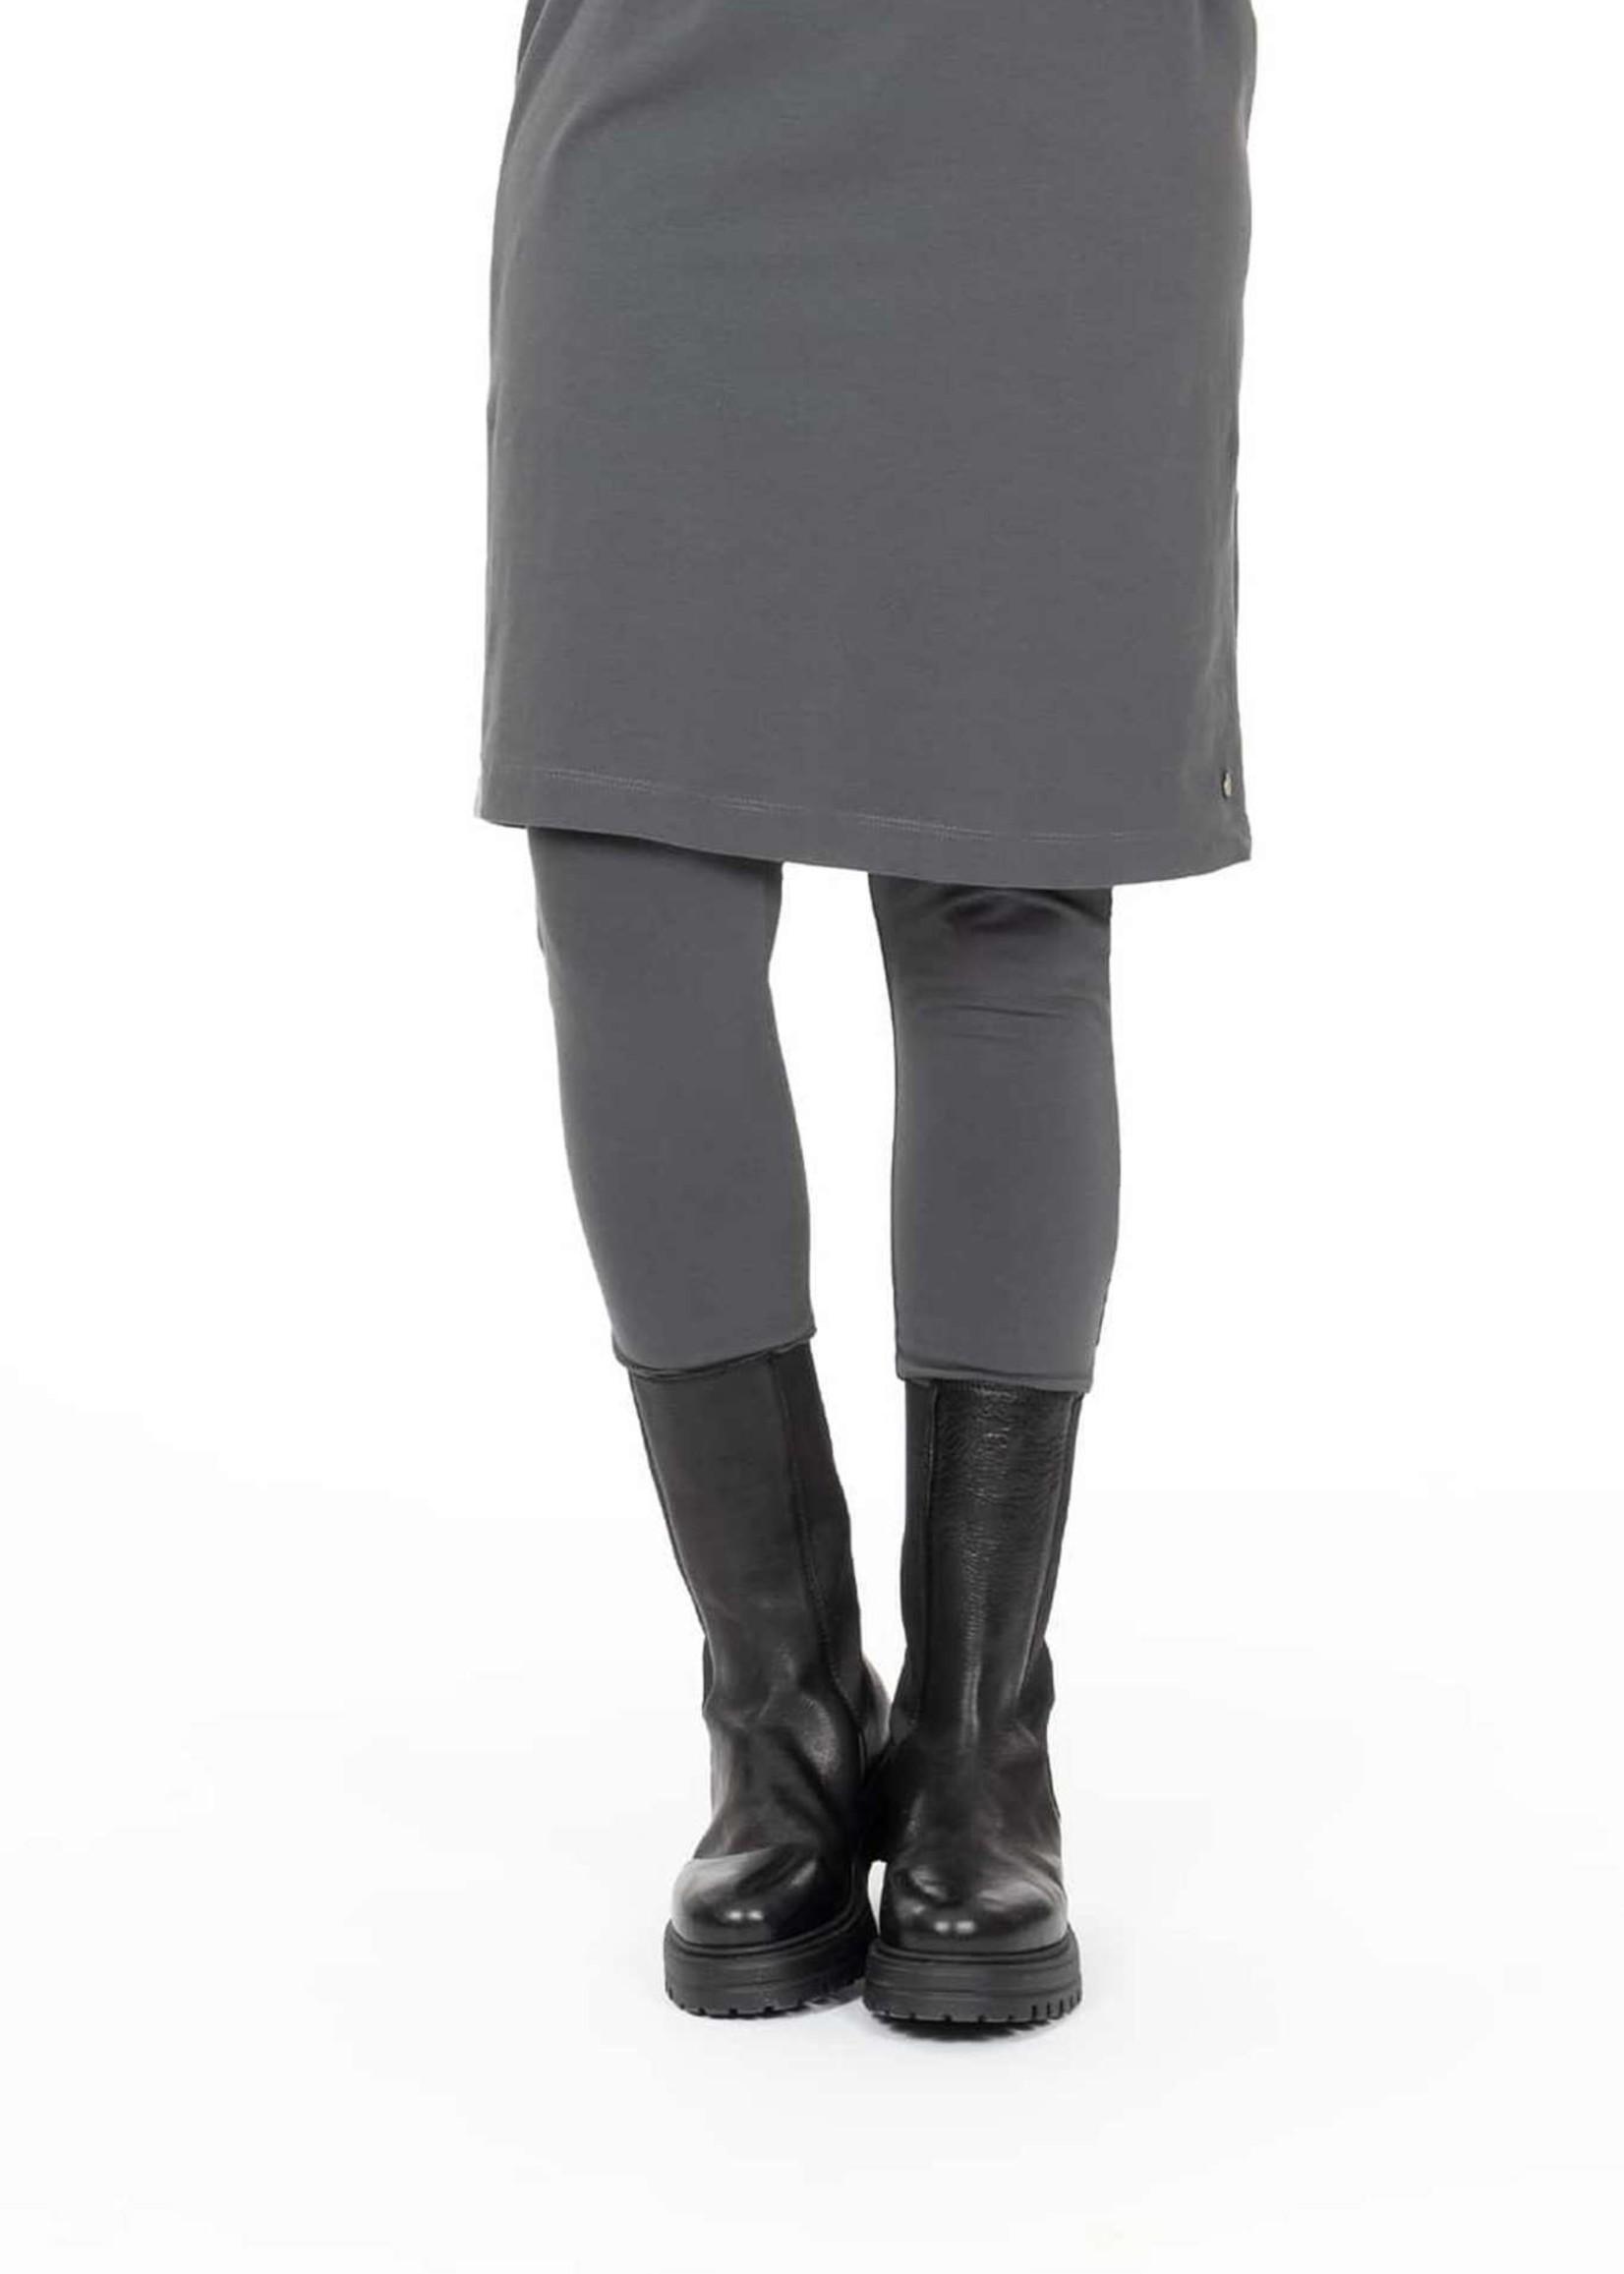 ZUSSS vlotte legging antracietgrijs